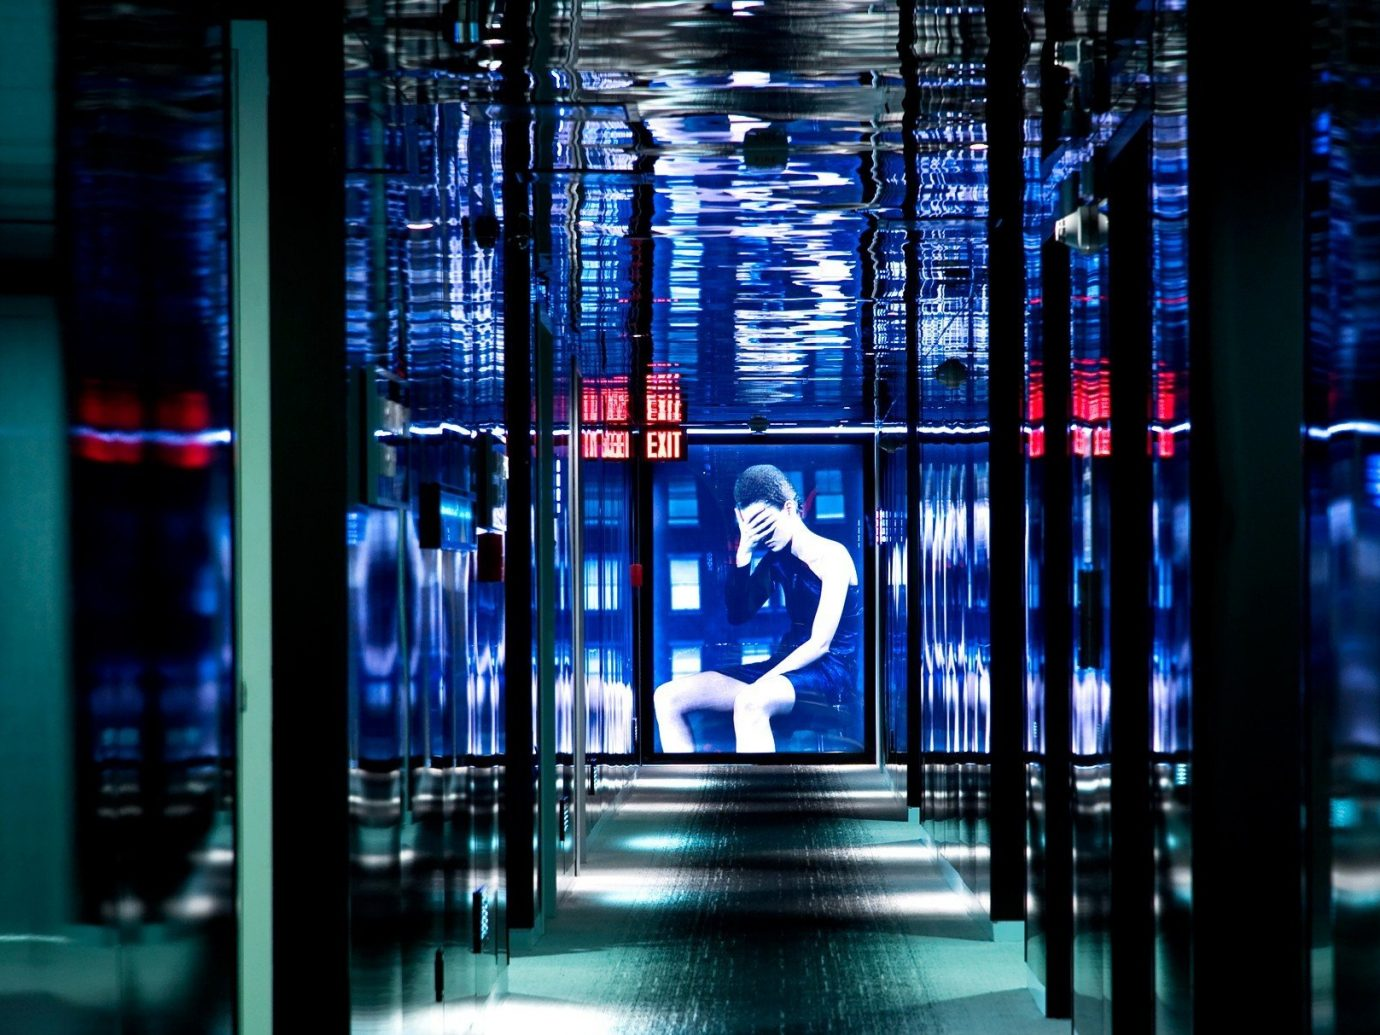 Hotels Offbeat light night reflection lighting stage interior design glass